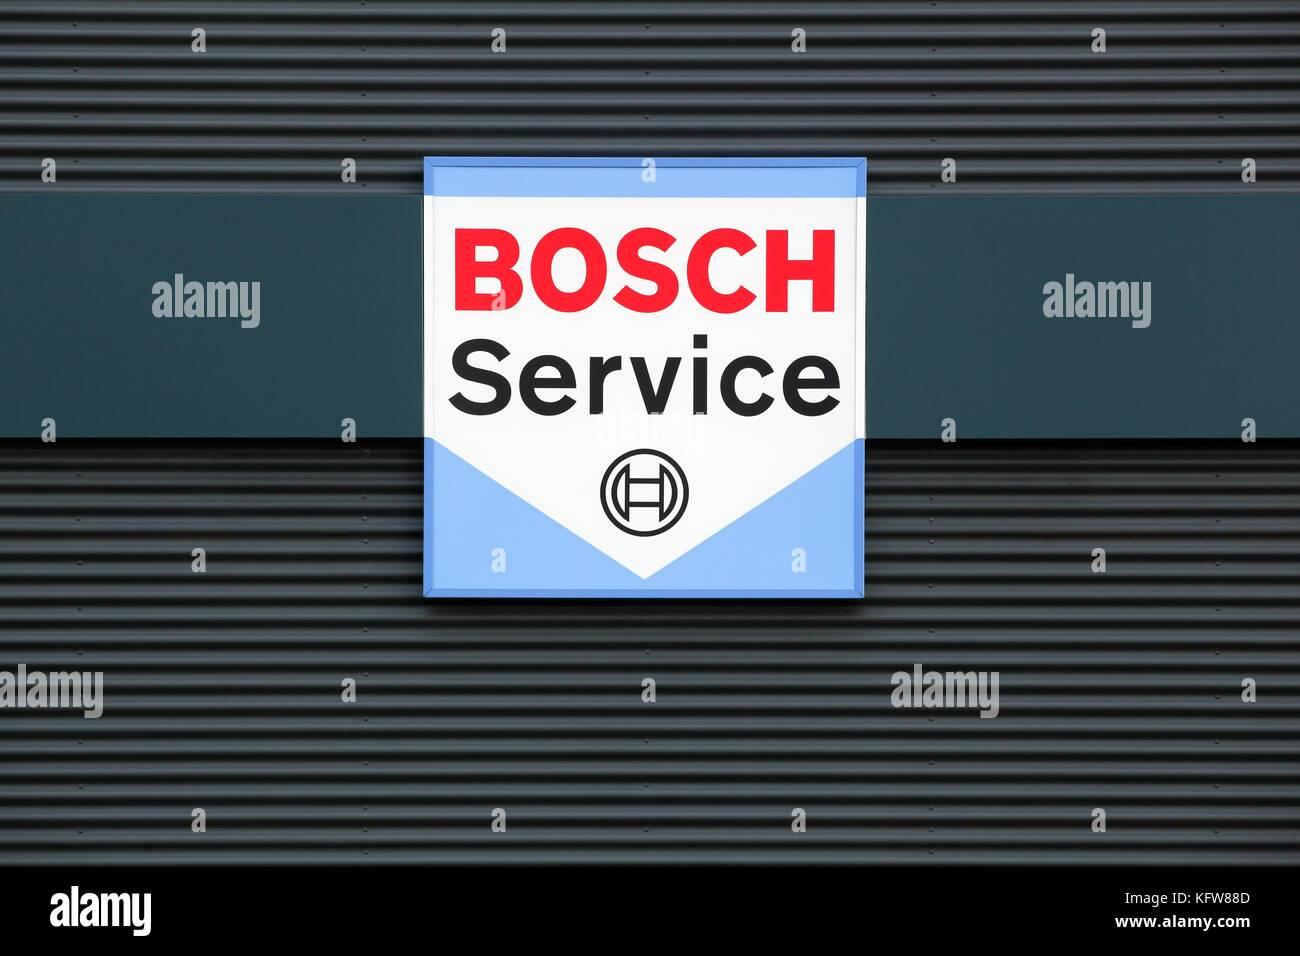 bosch logo stock photos amp bosch logo stock images alamy